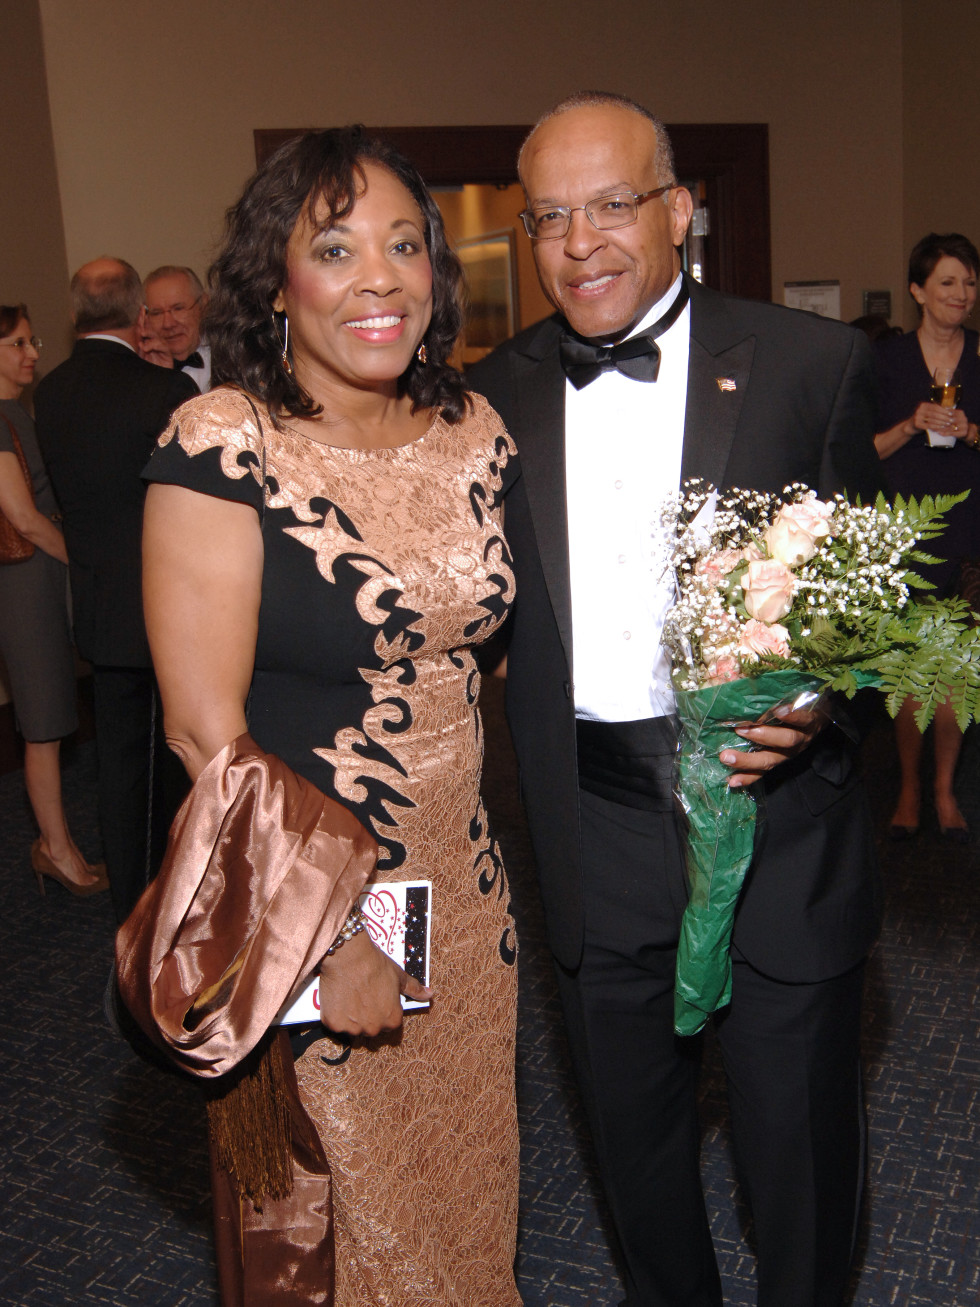 UH Law gala, April 2016, Judge Vanessa Gilmore, Kevin Moore